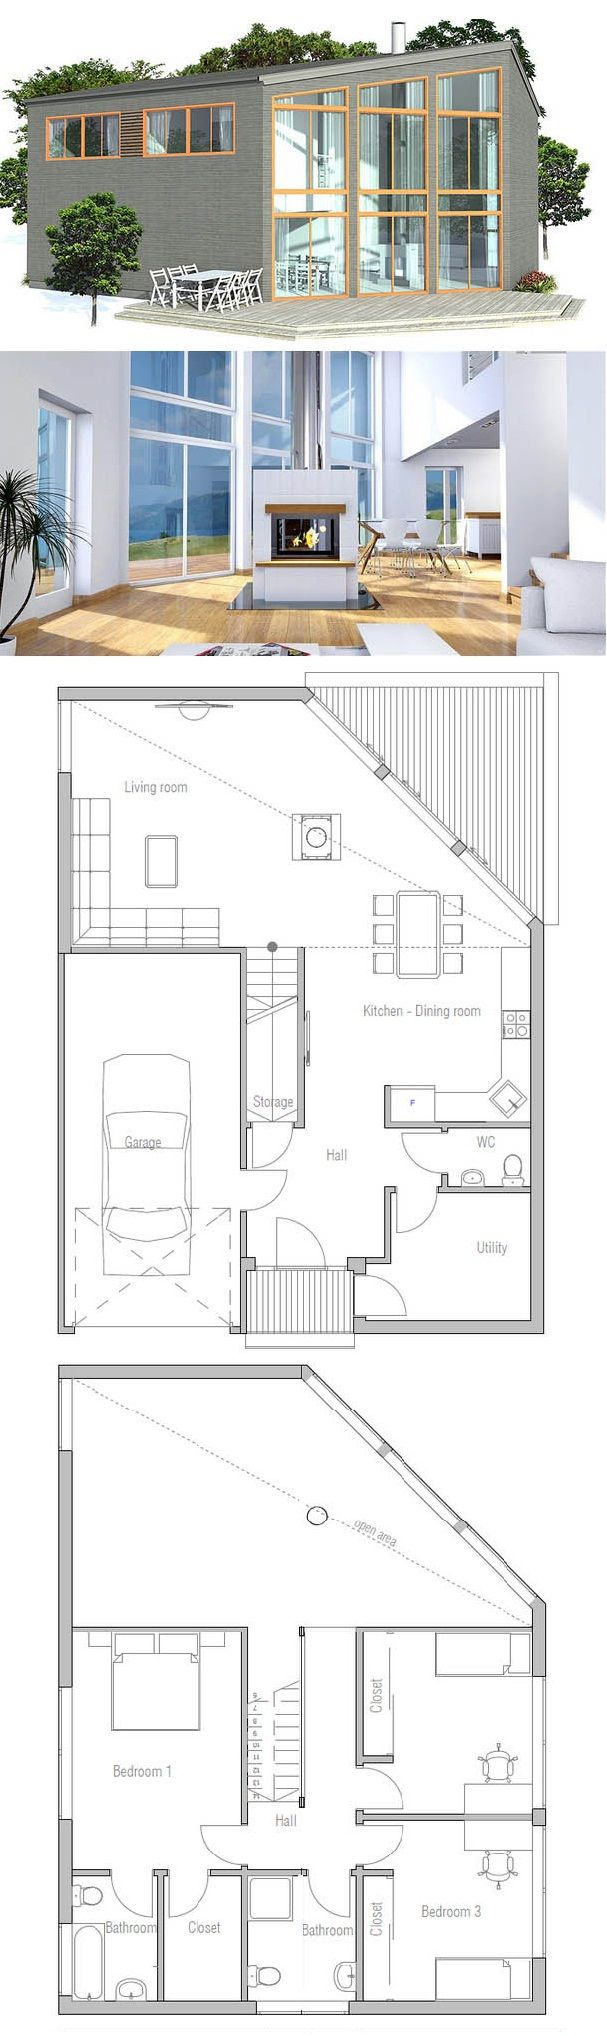 Modern House Plan 2 glassed levels #twostoreyhomeplans